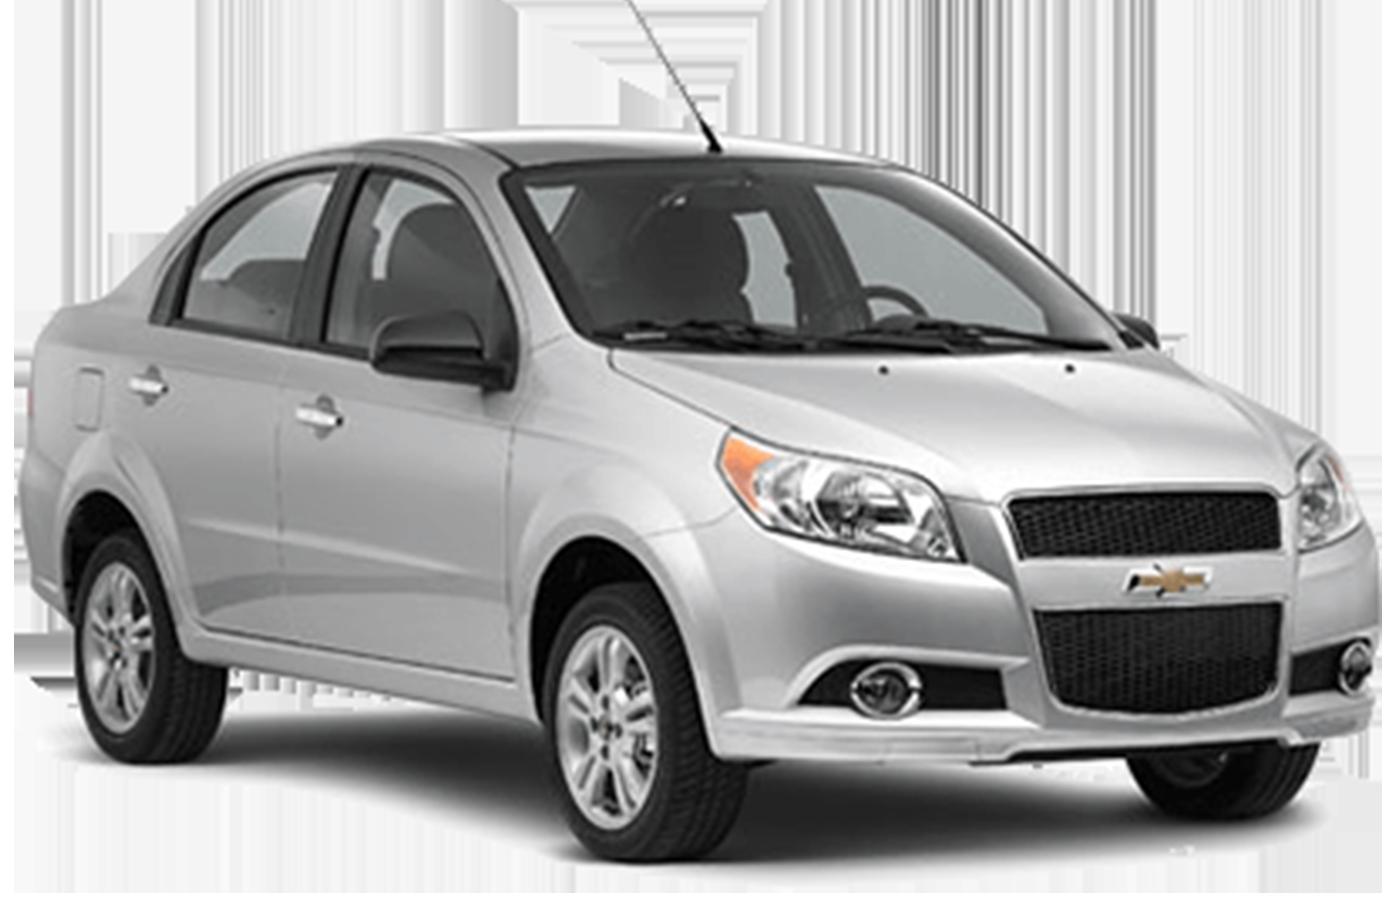 Kelebihan Kekurangan Toyota Aveo Murah Berkualitas